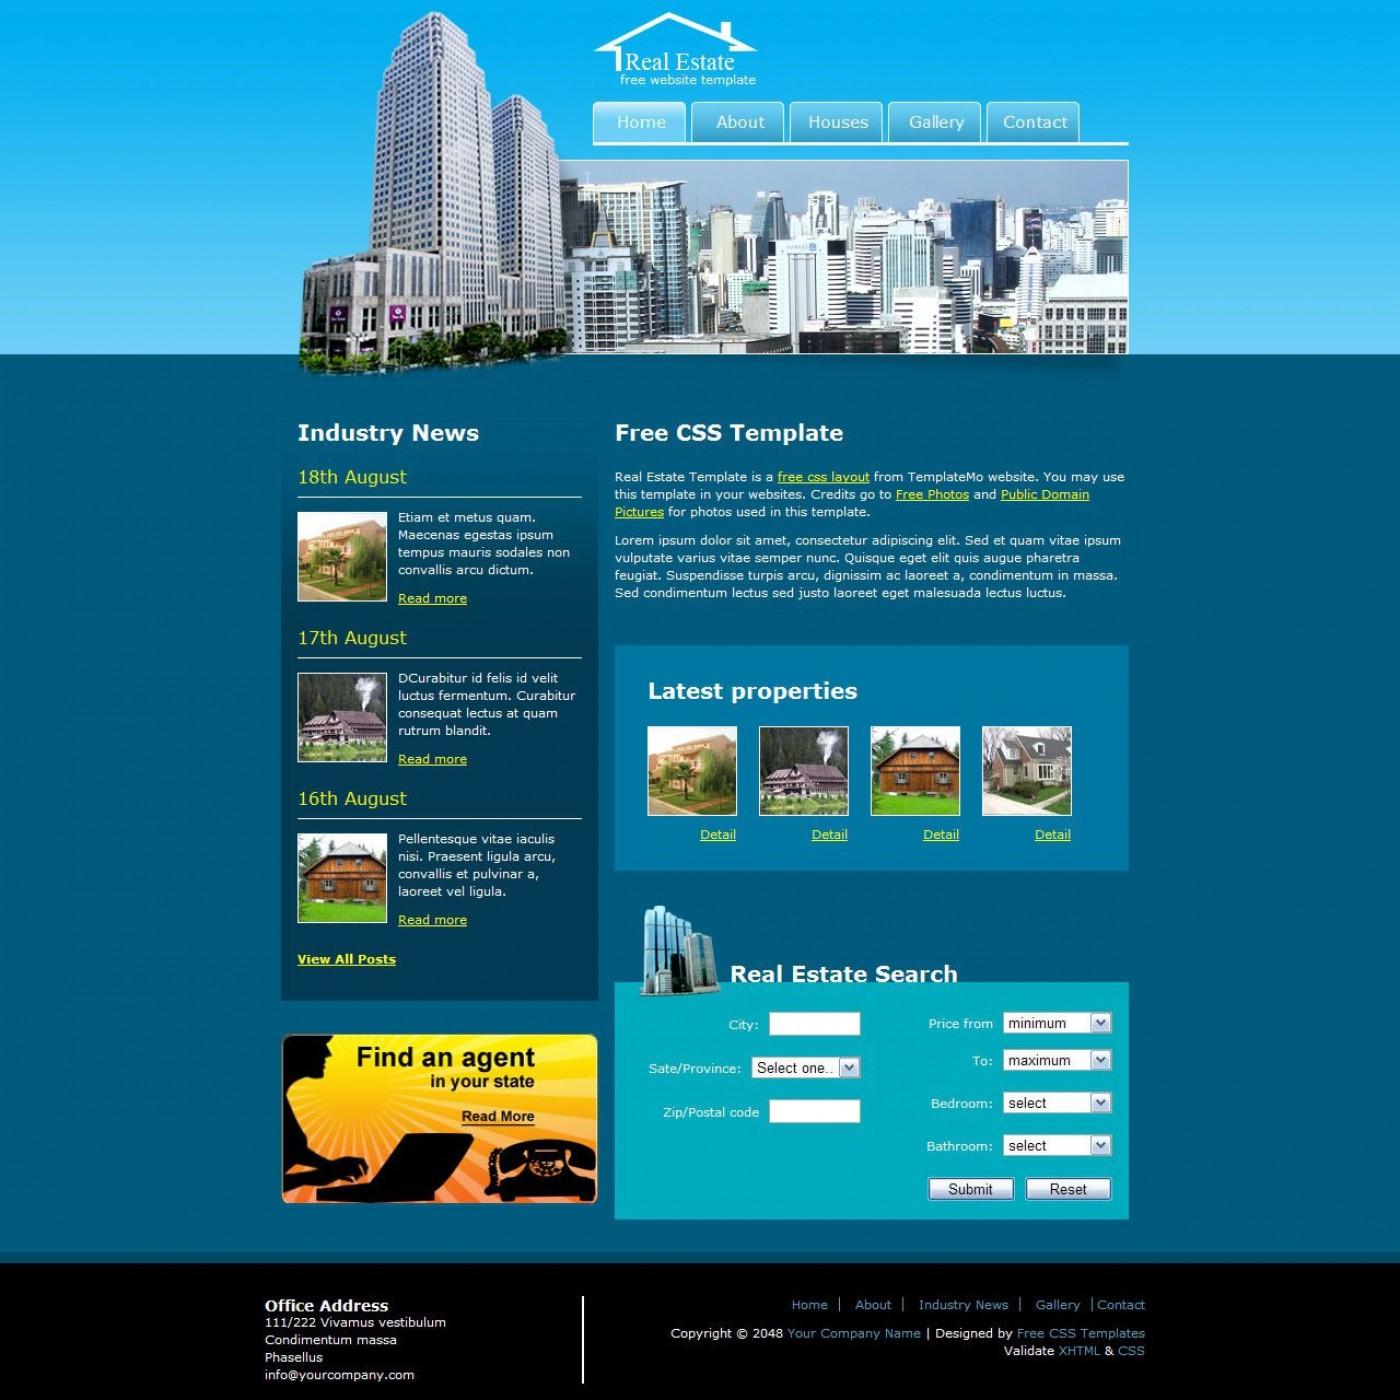 008 Impressive Free Real Estate Template High Definition  Website Download Bootstrap 41400